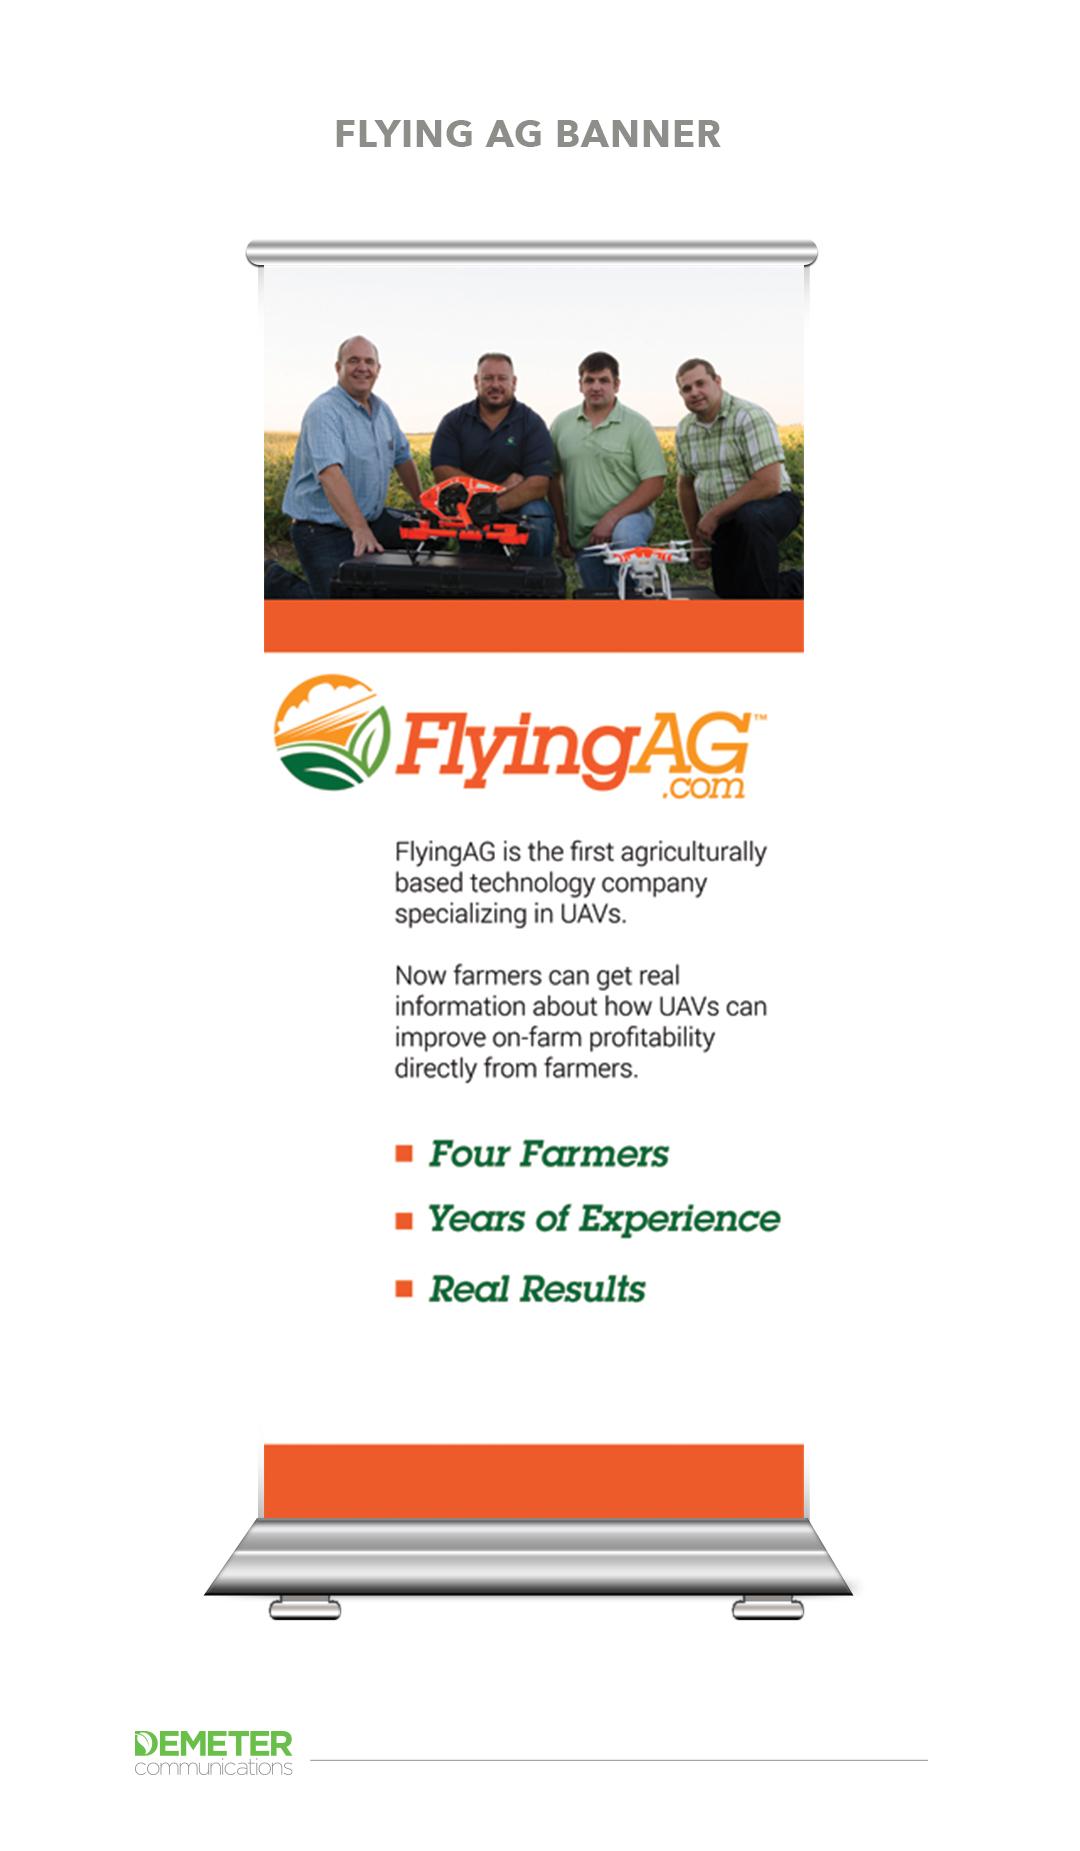 FlyingAgBanner.jpg